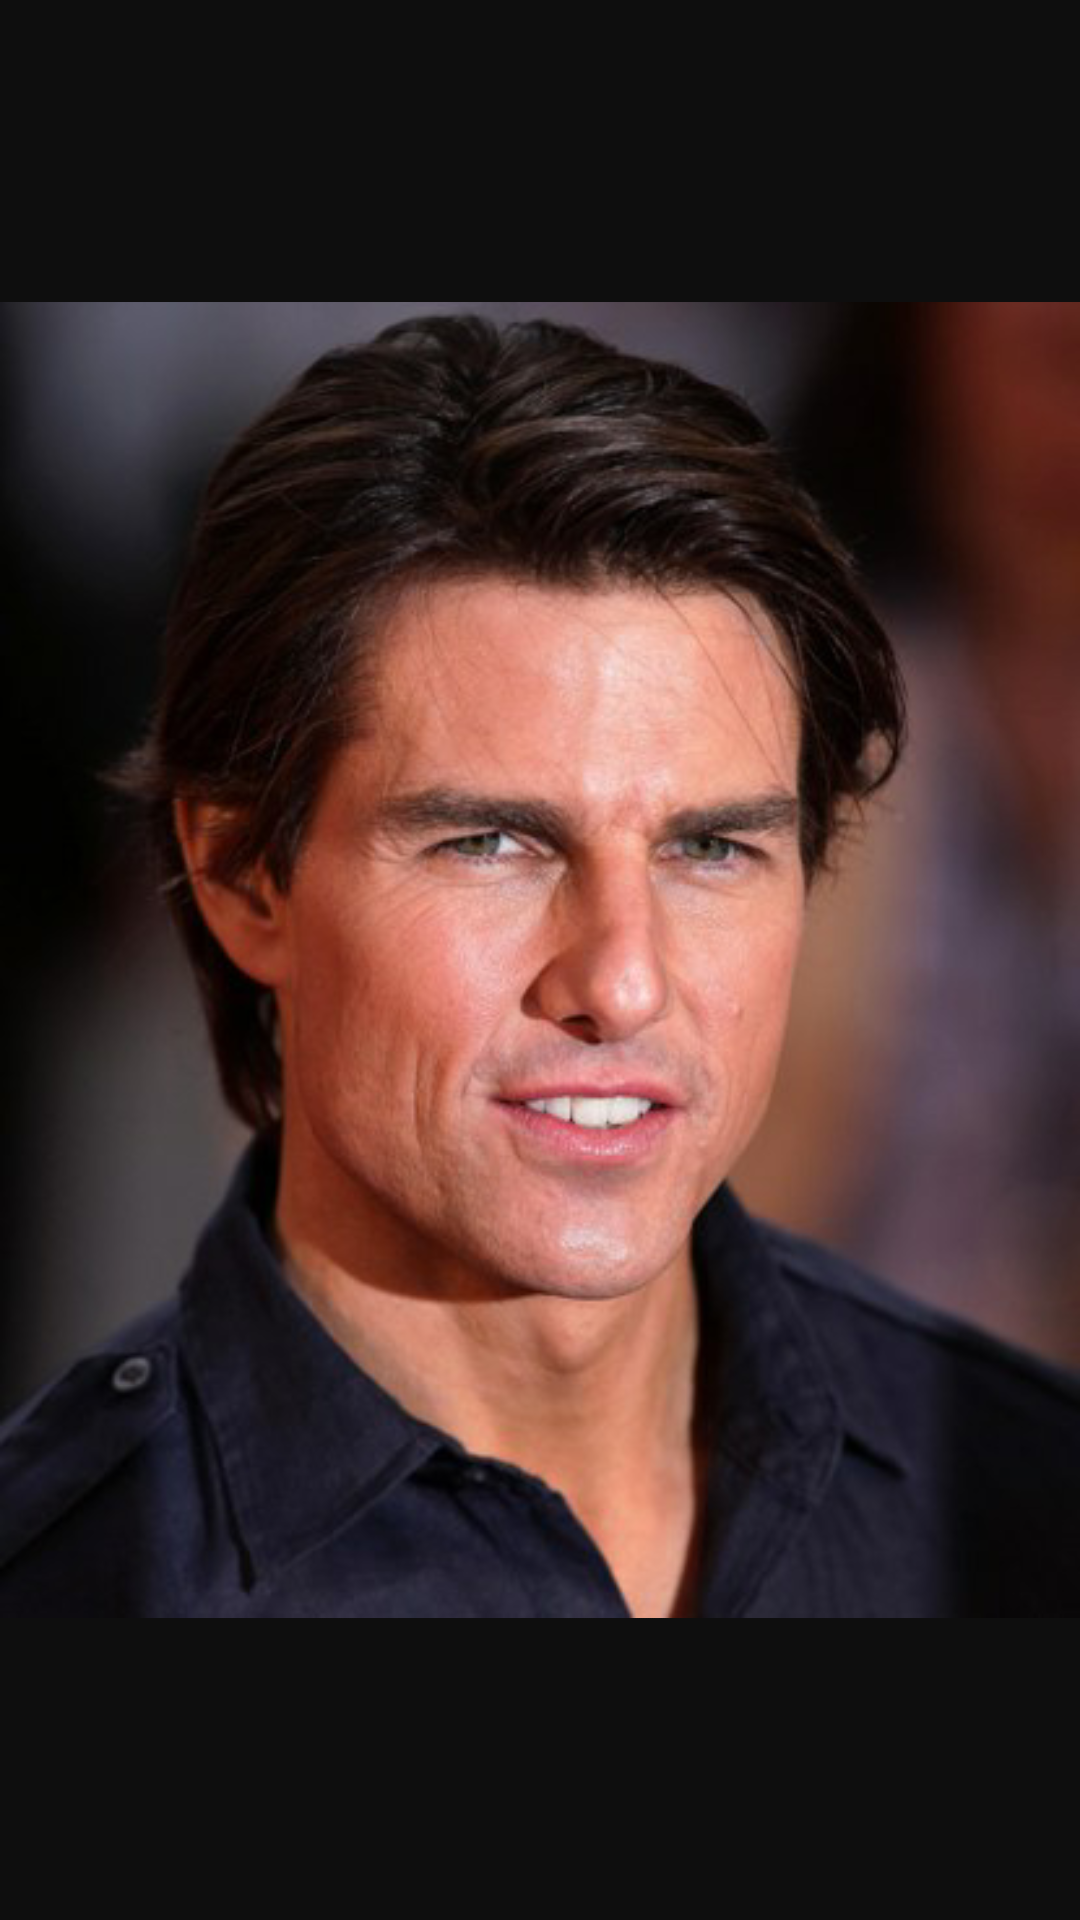 Pin Di Sabine Wdh Su Tom Cruise Attori